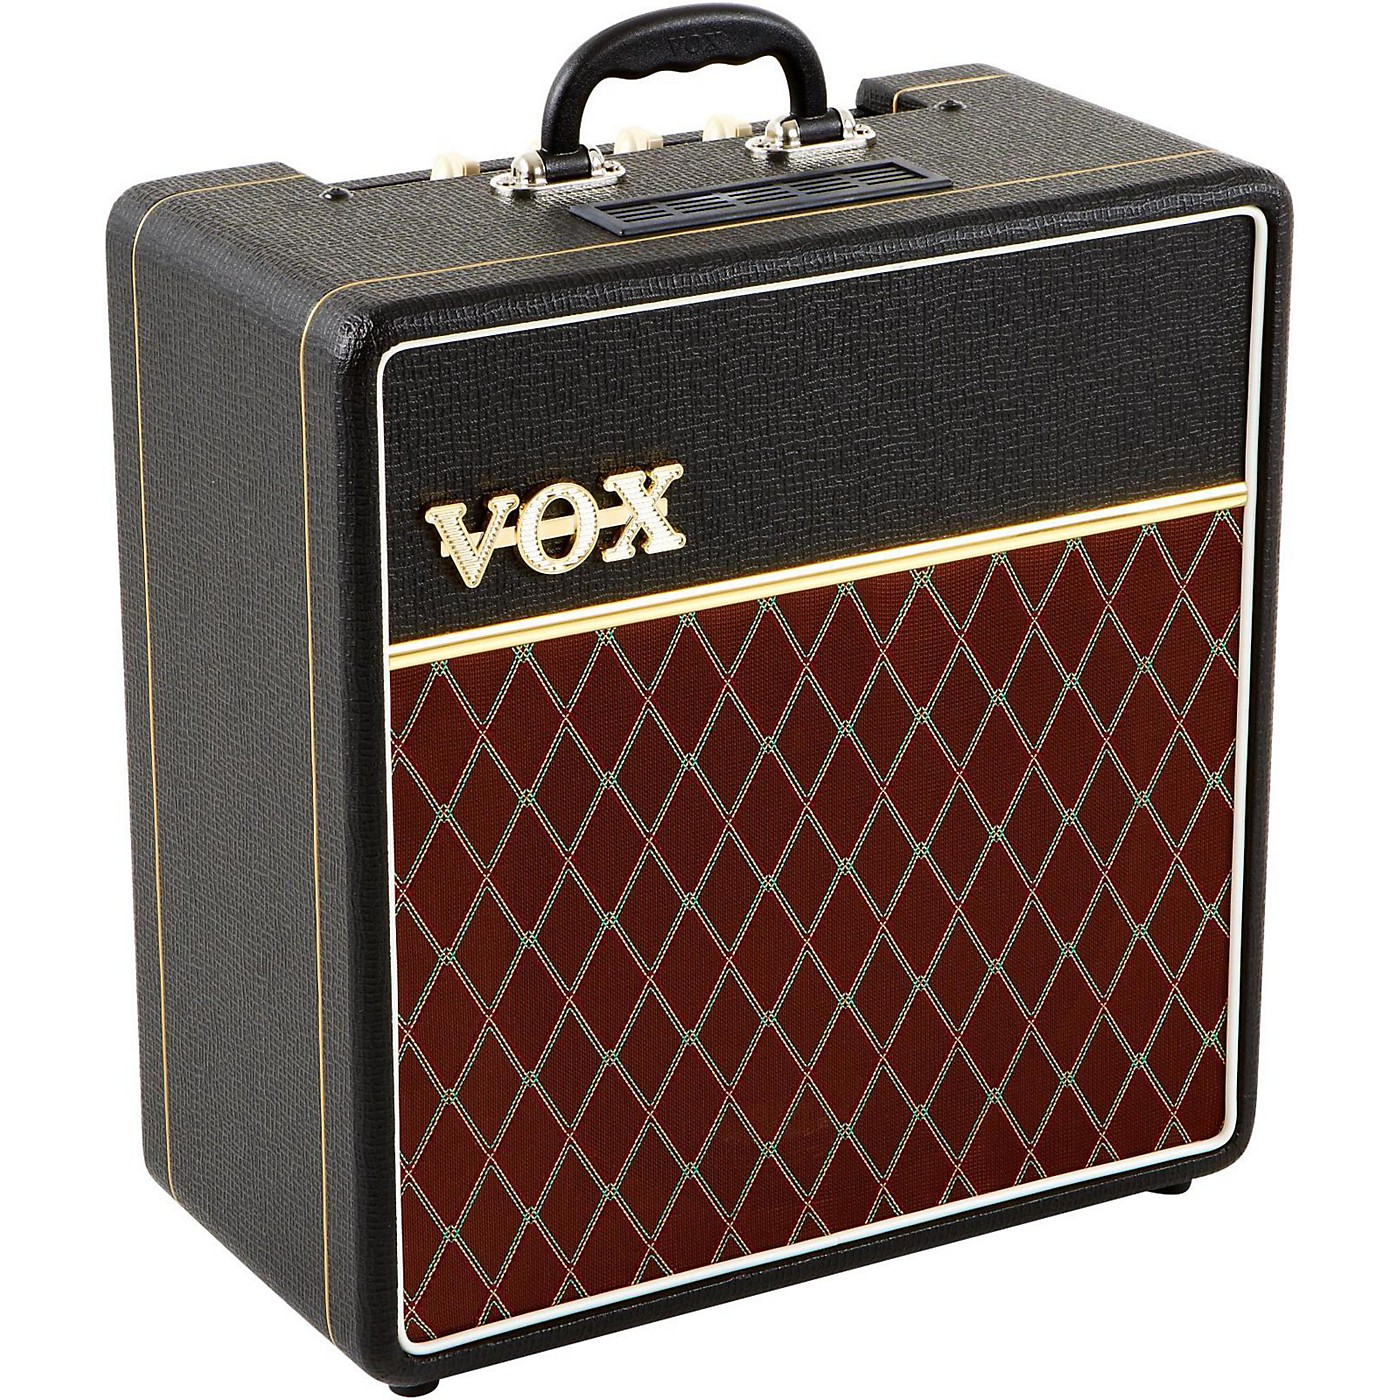 Vox AC4C1-12 Classic 4W 1x12 Tube Guitar Combo Amp thumbnail